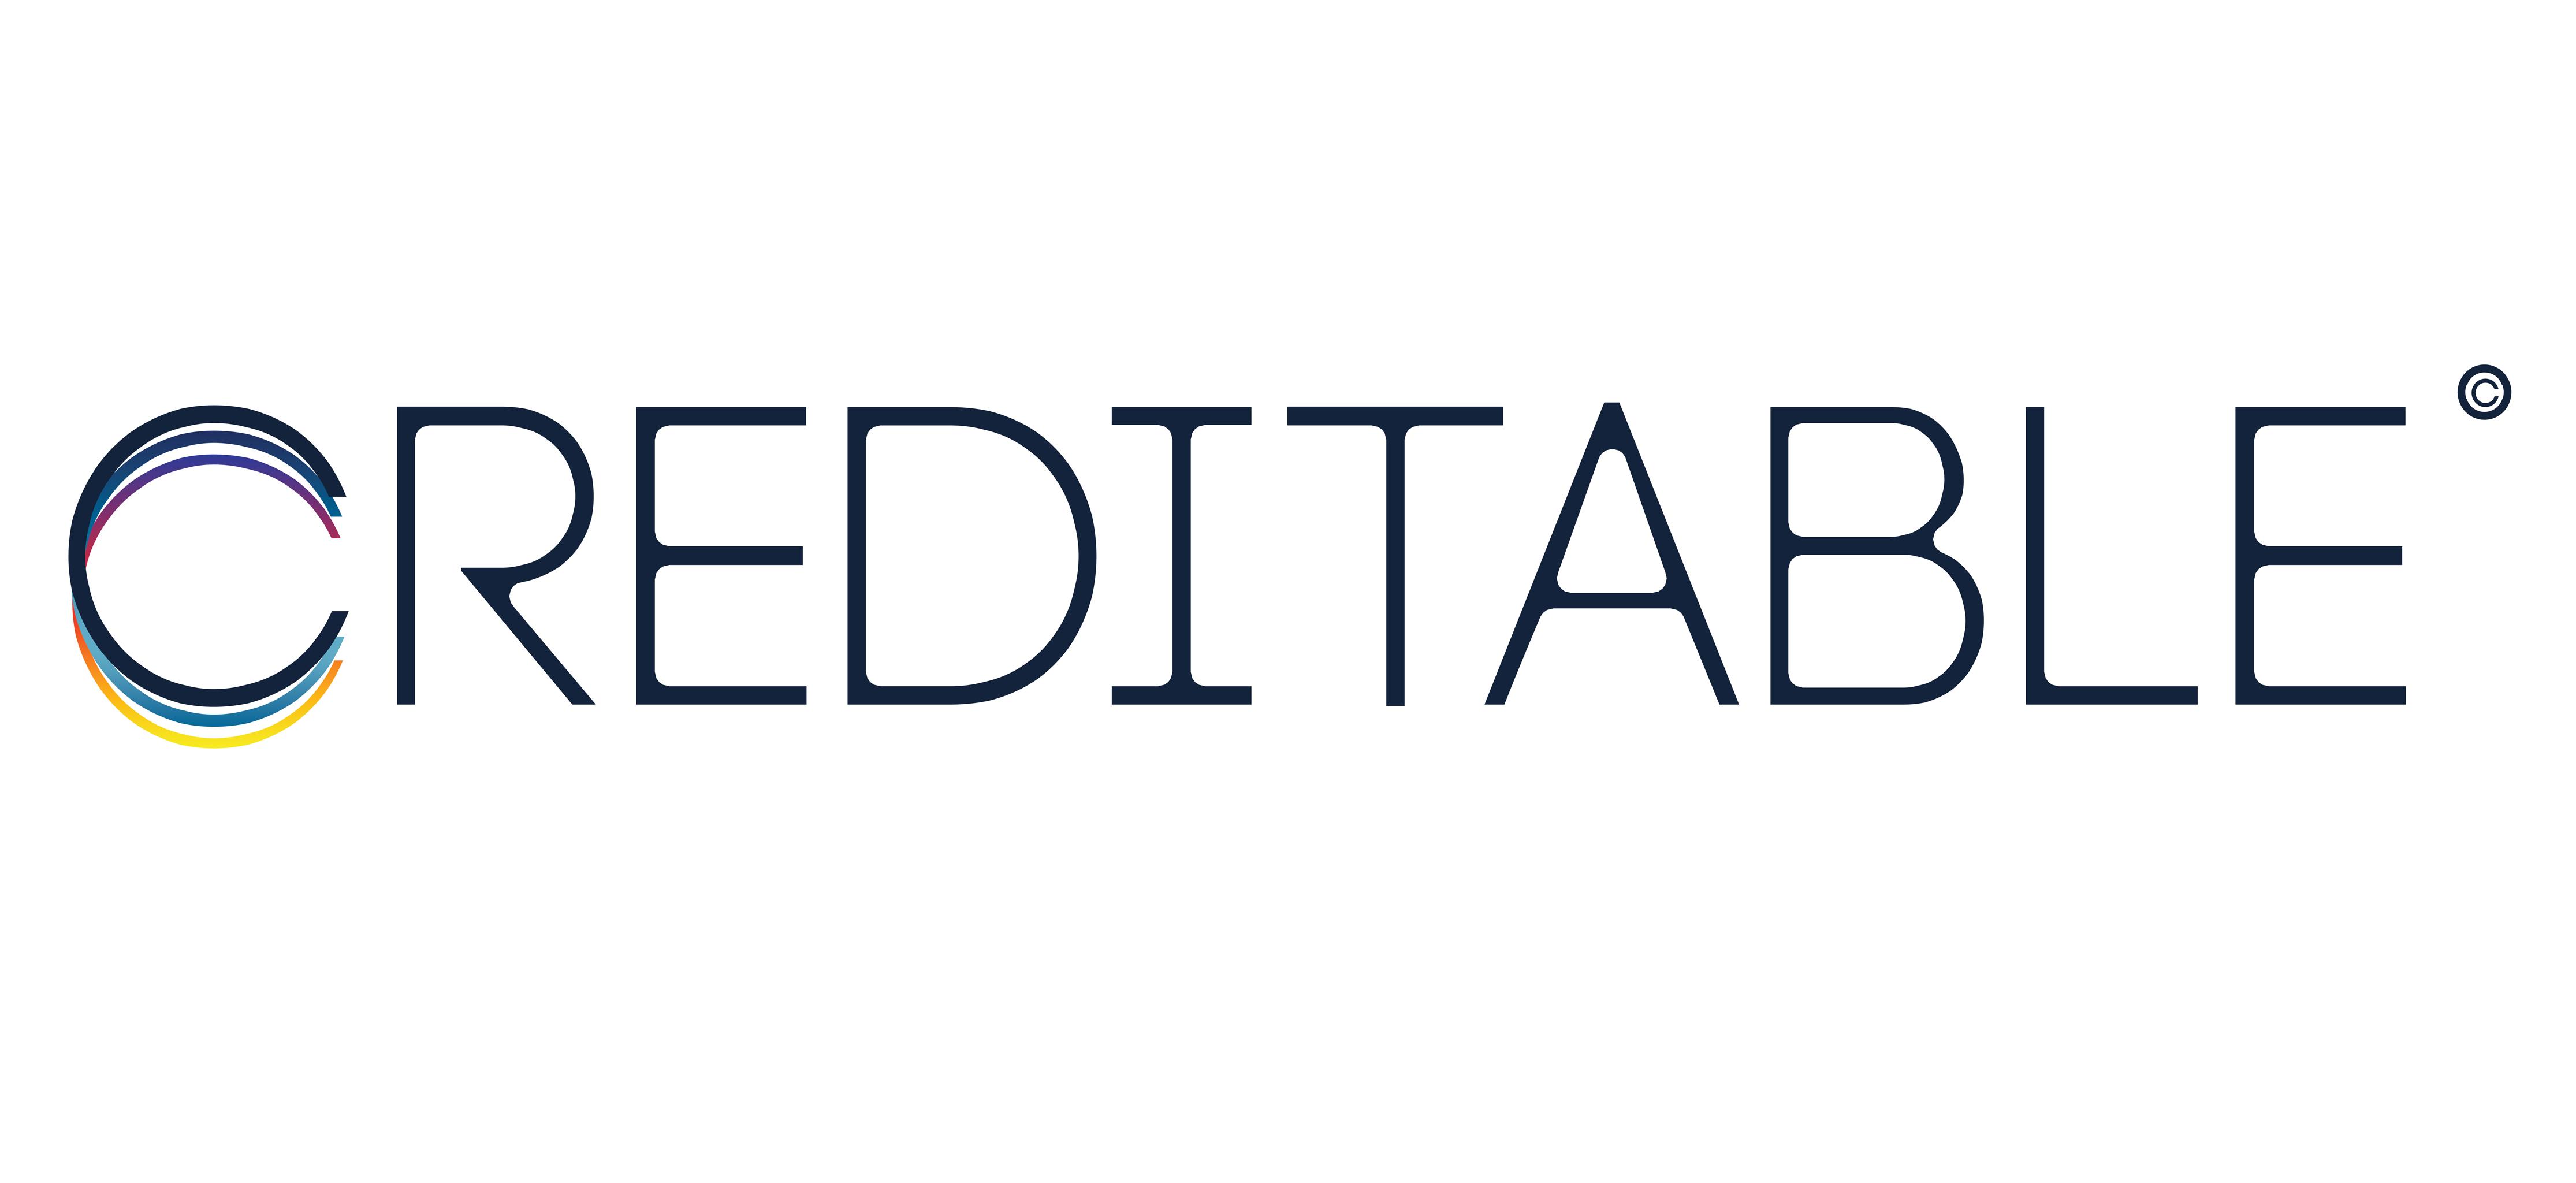 Creditable logo old